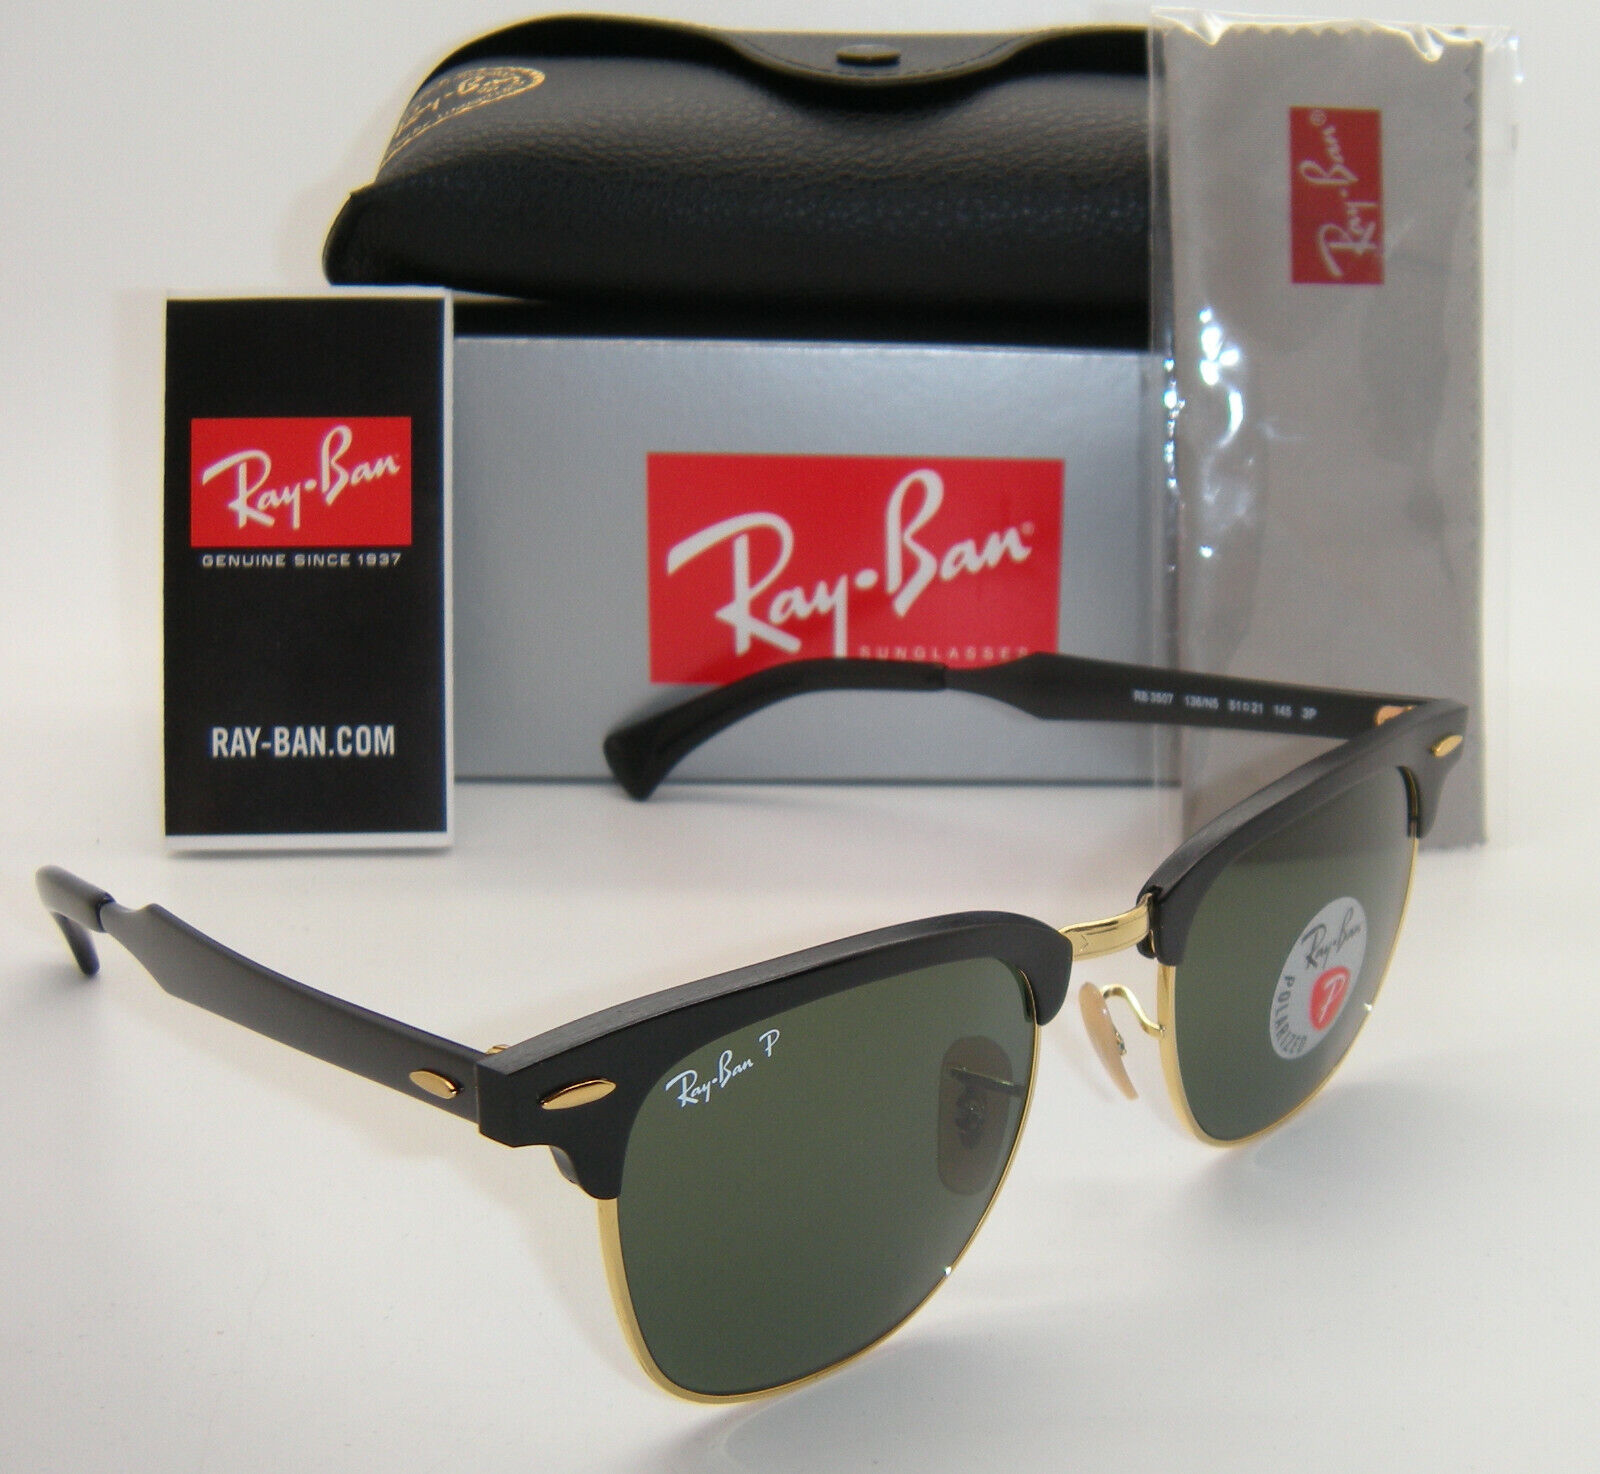 RAY BAN Sunglasses RB 3507 136/N5 Black Arista 51MM